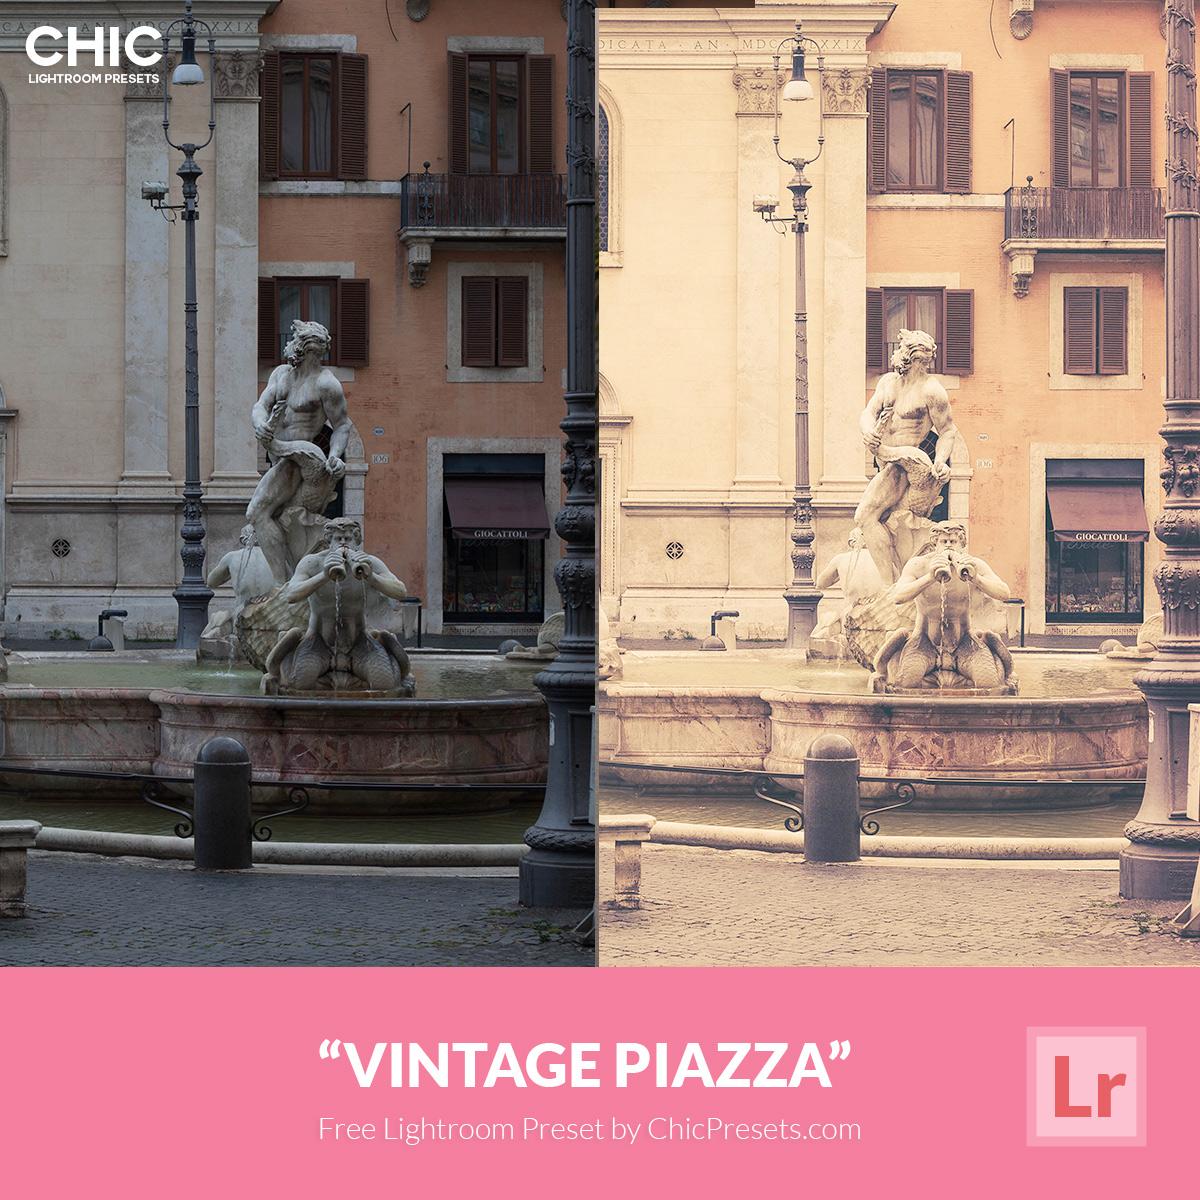 Free Lightroom Preset Vintage Piazza